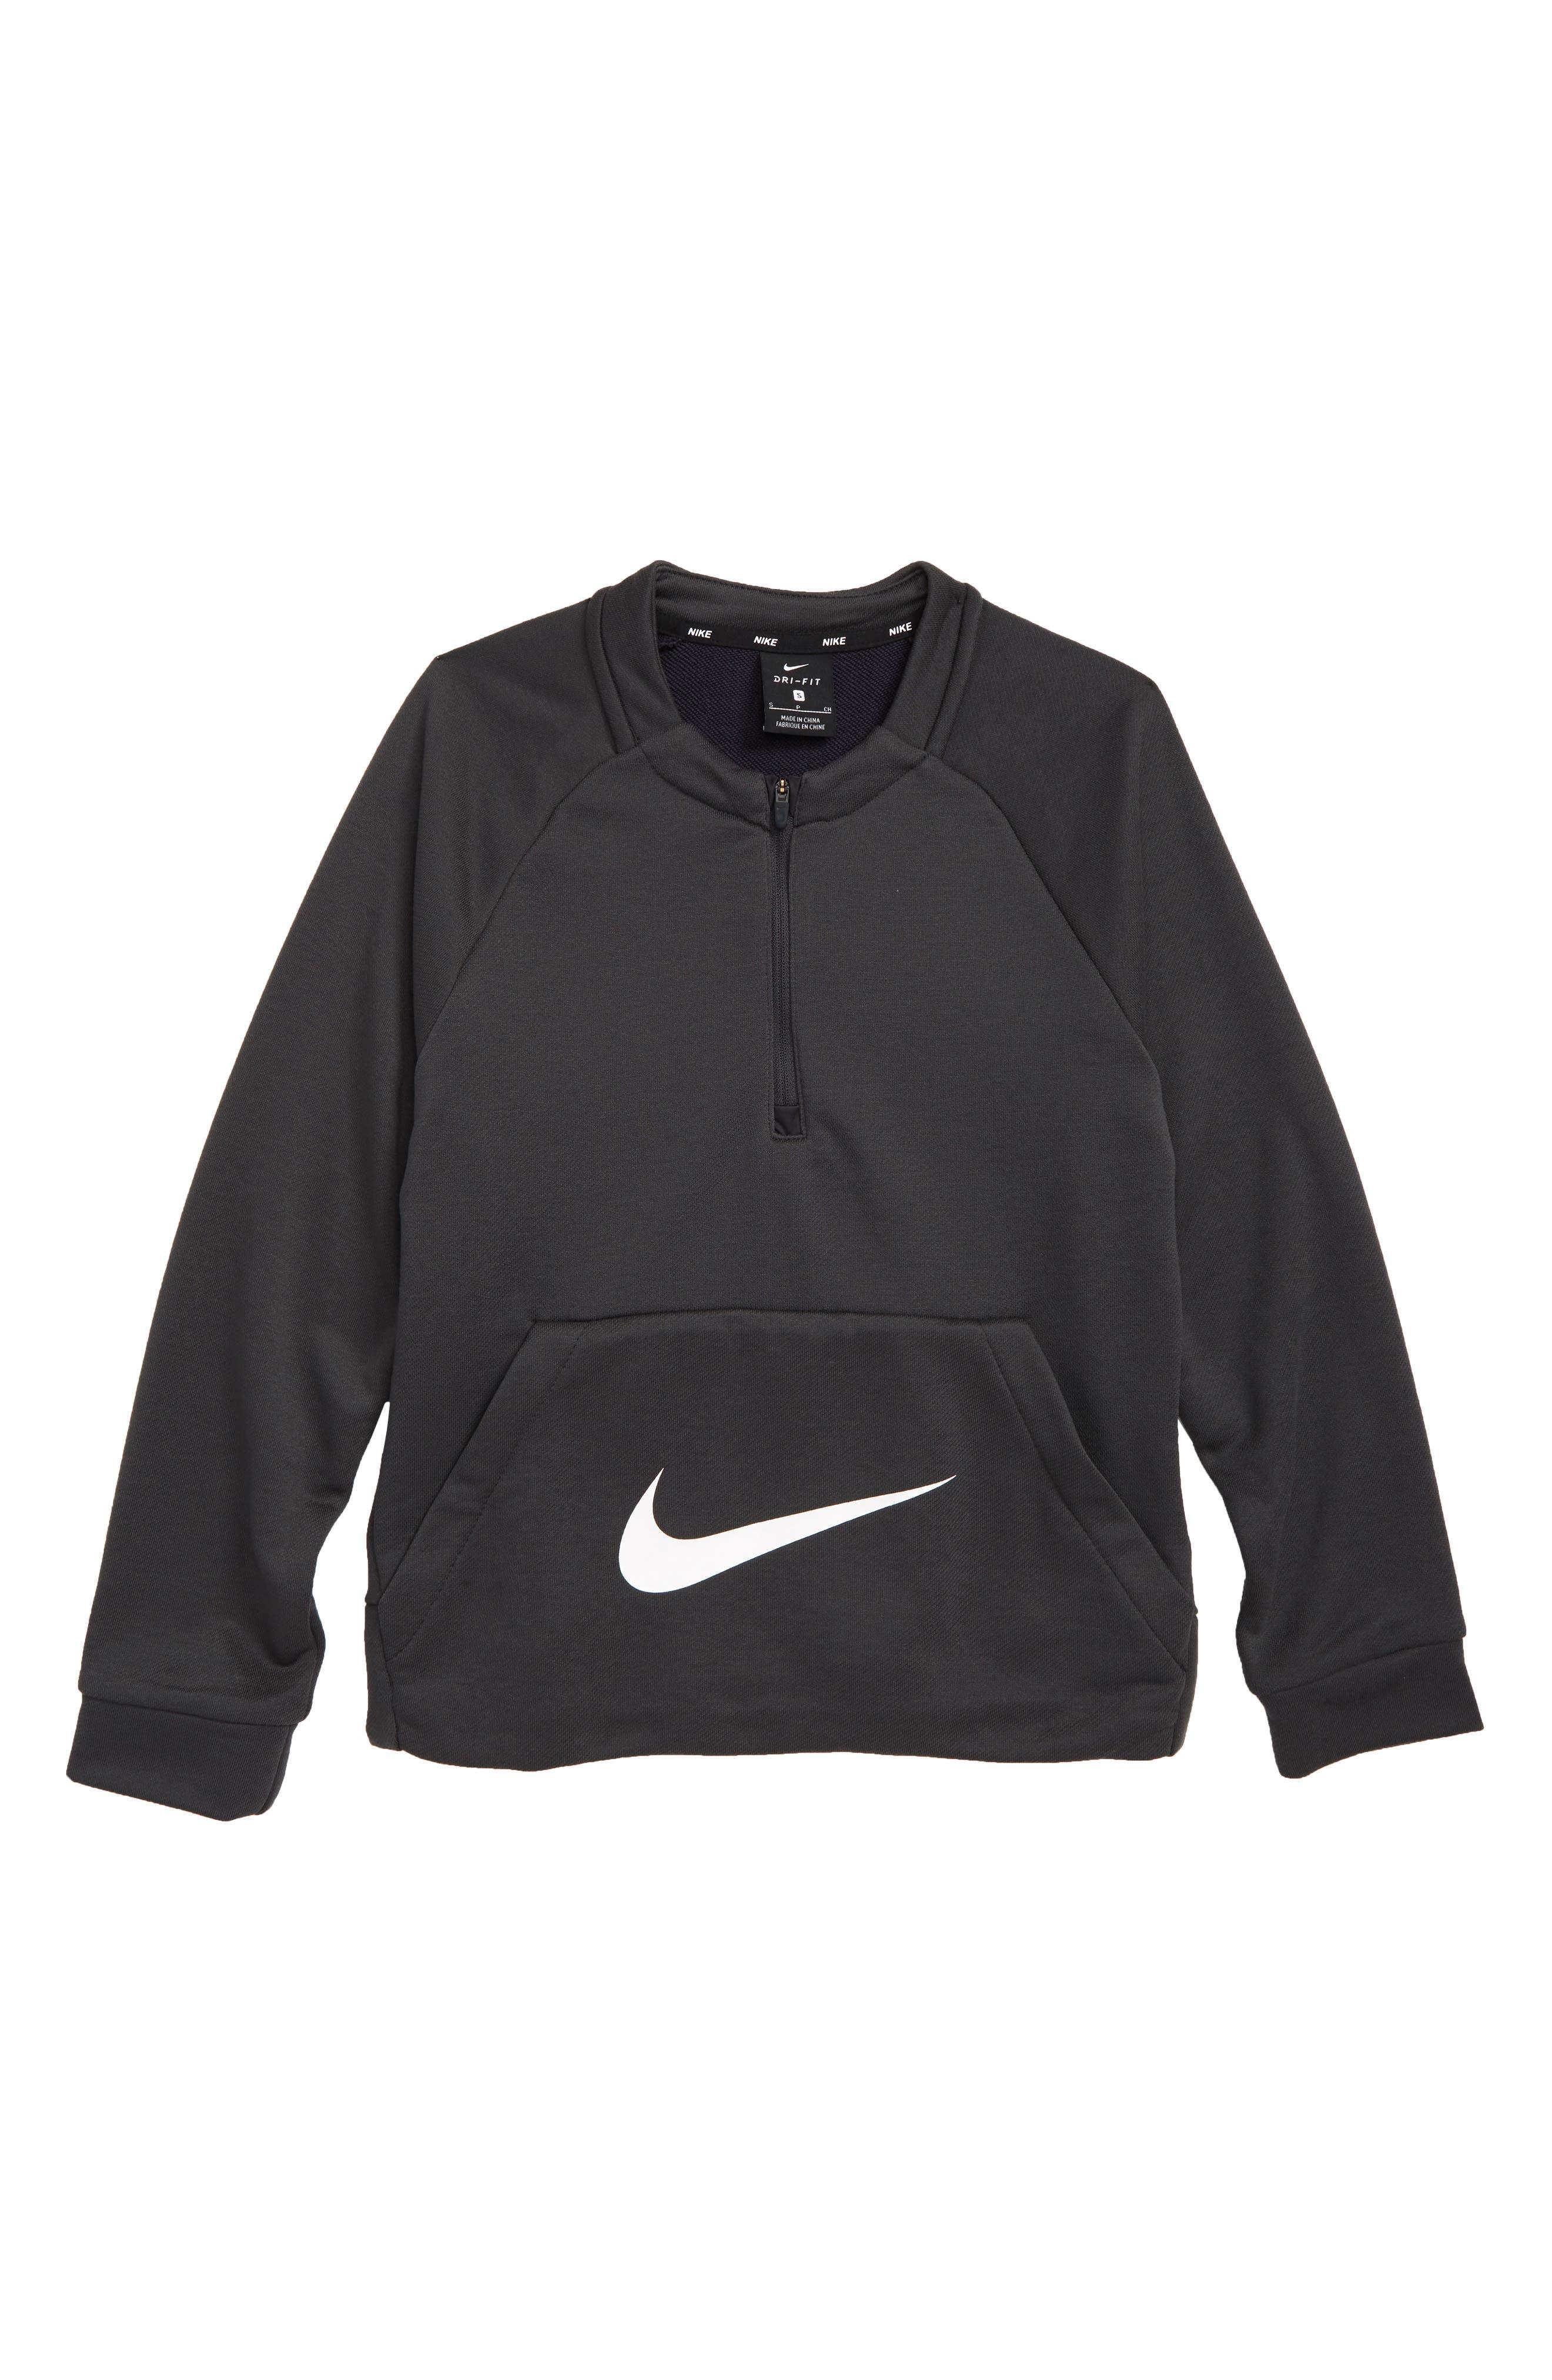 Dry Quarter Zip Pullover,                         Main,                         color, ANTHRACITE/ WHITE